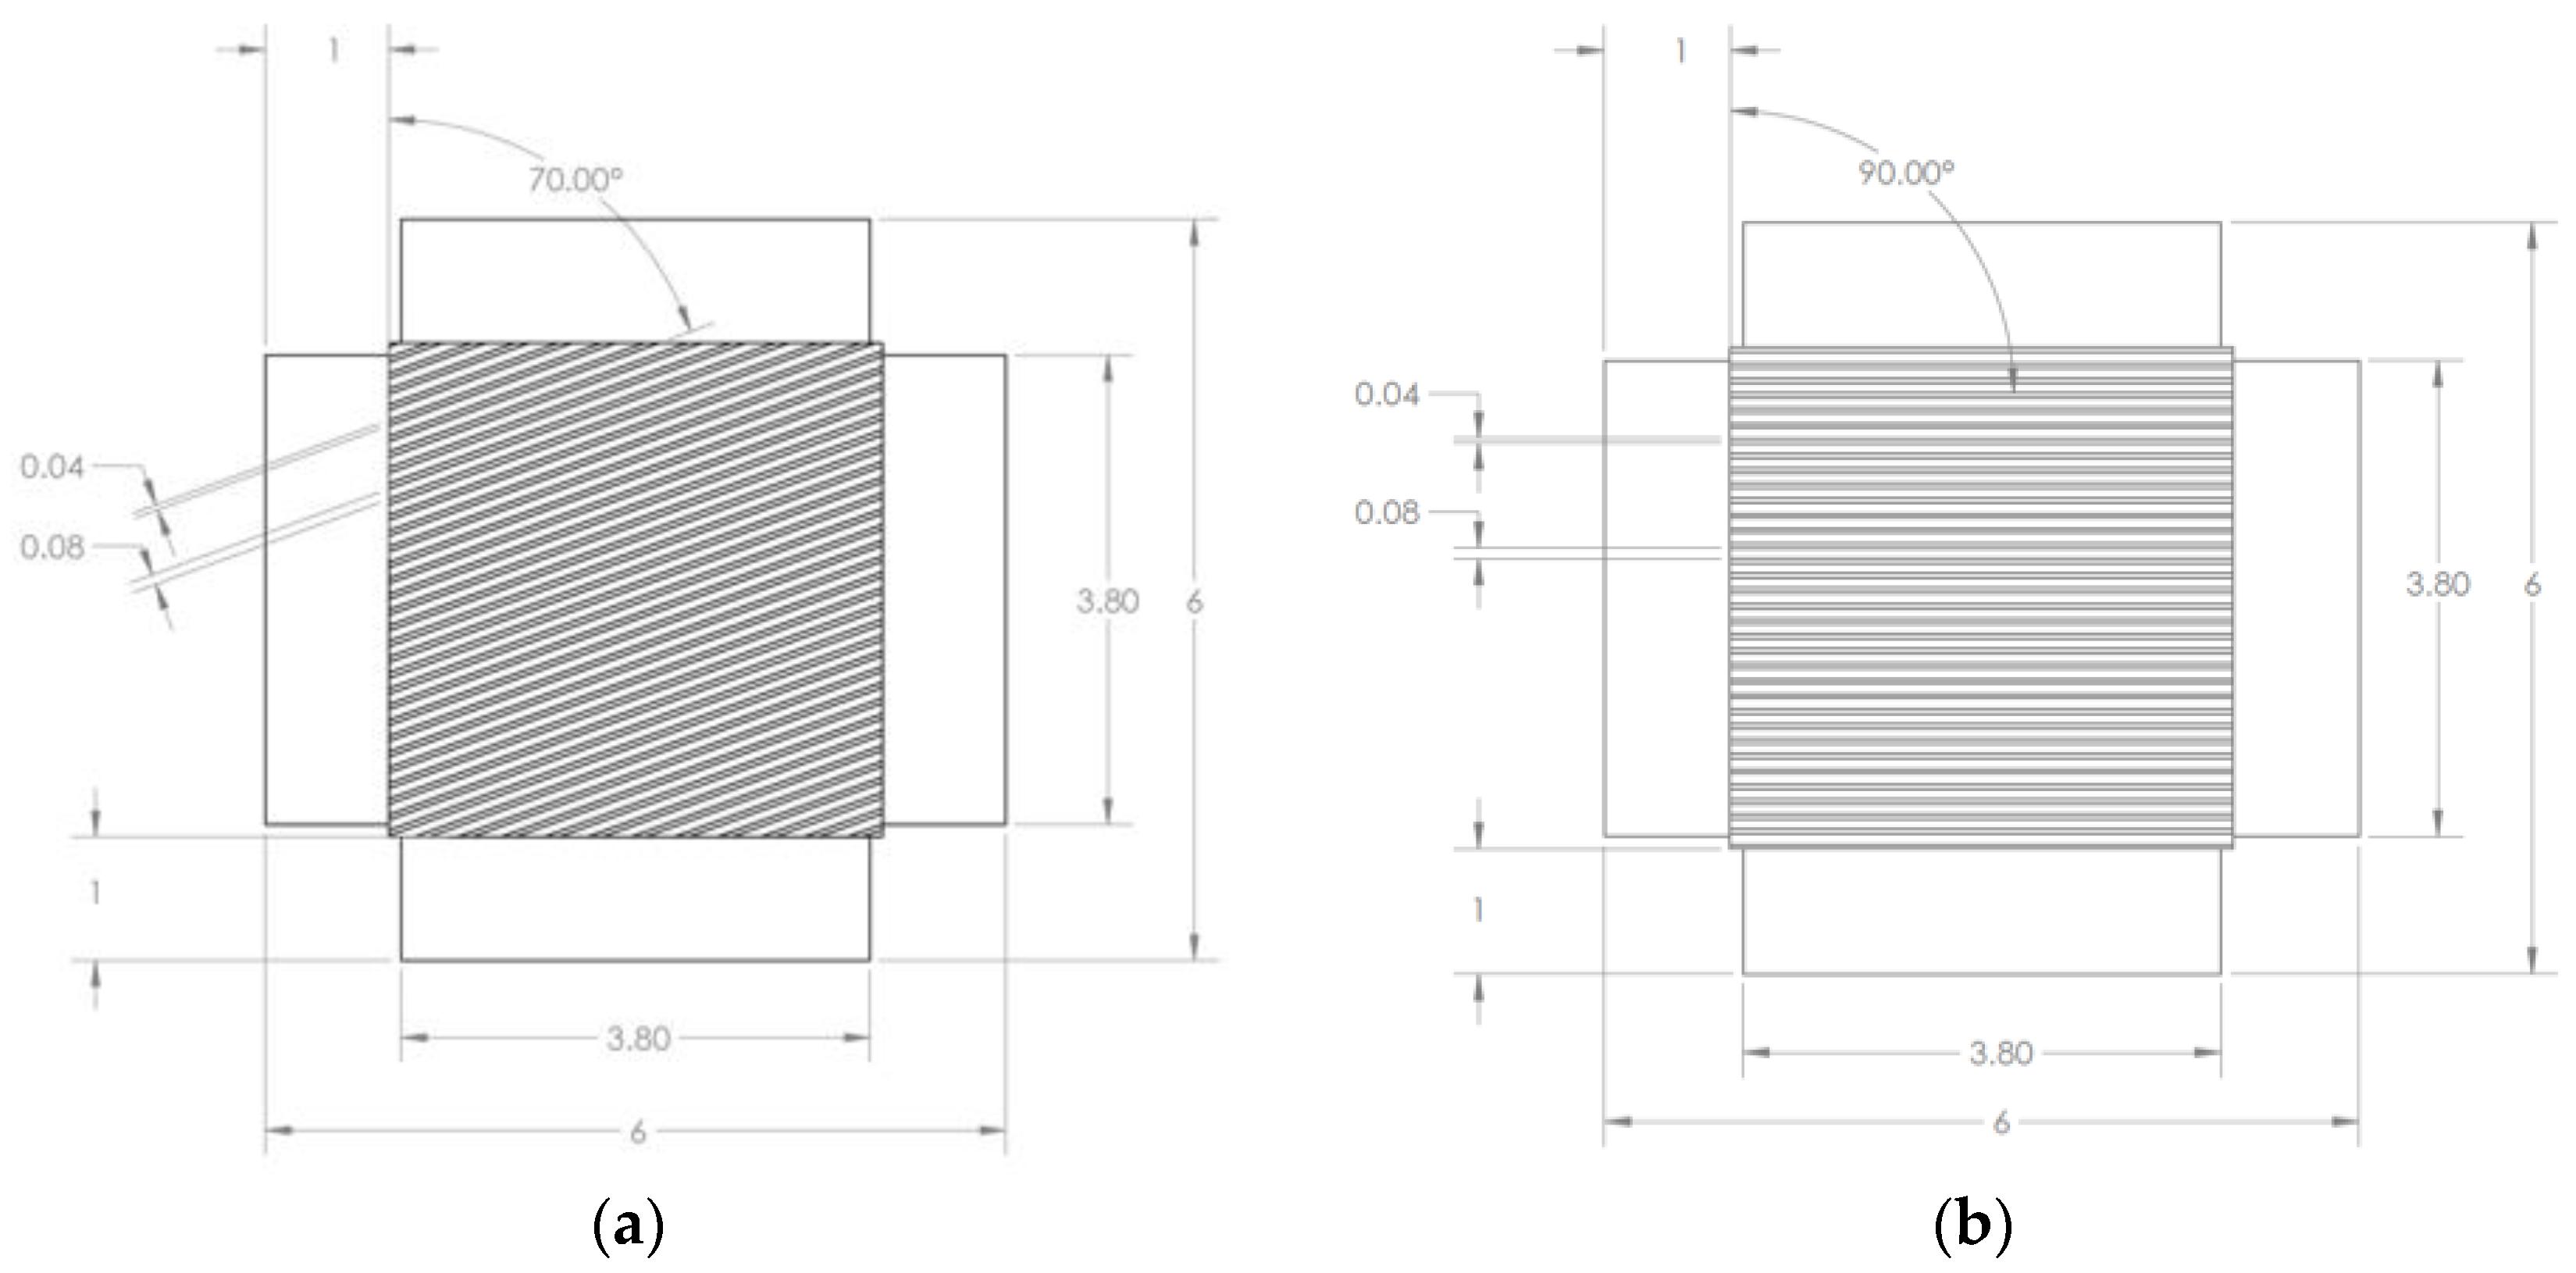 Sensors Free Full Text Foil Strain Gauges Using Piezoresistive Thread Wj Vacuum Diagram 18 00464 G004